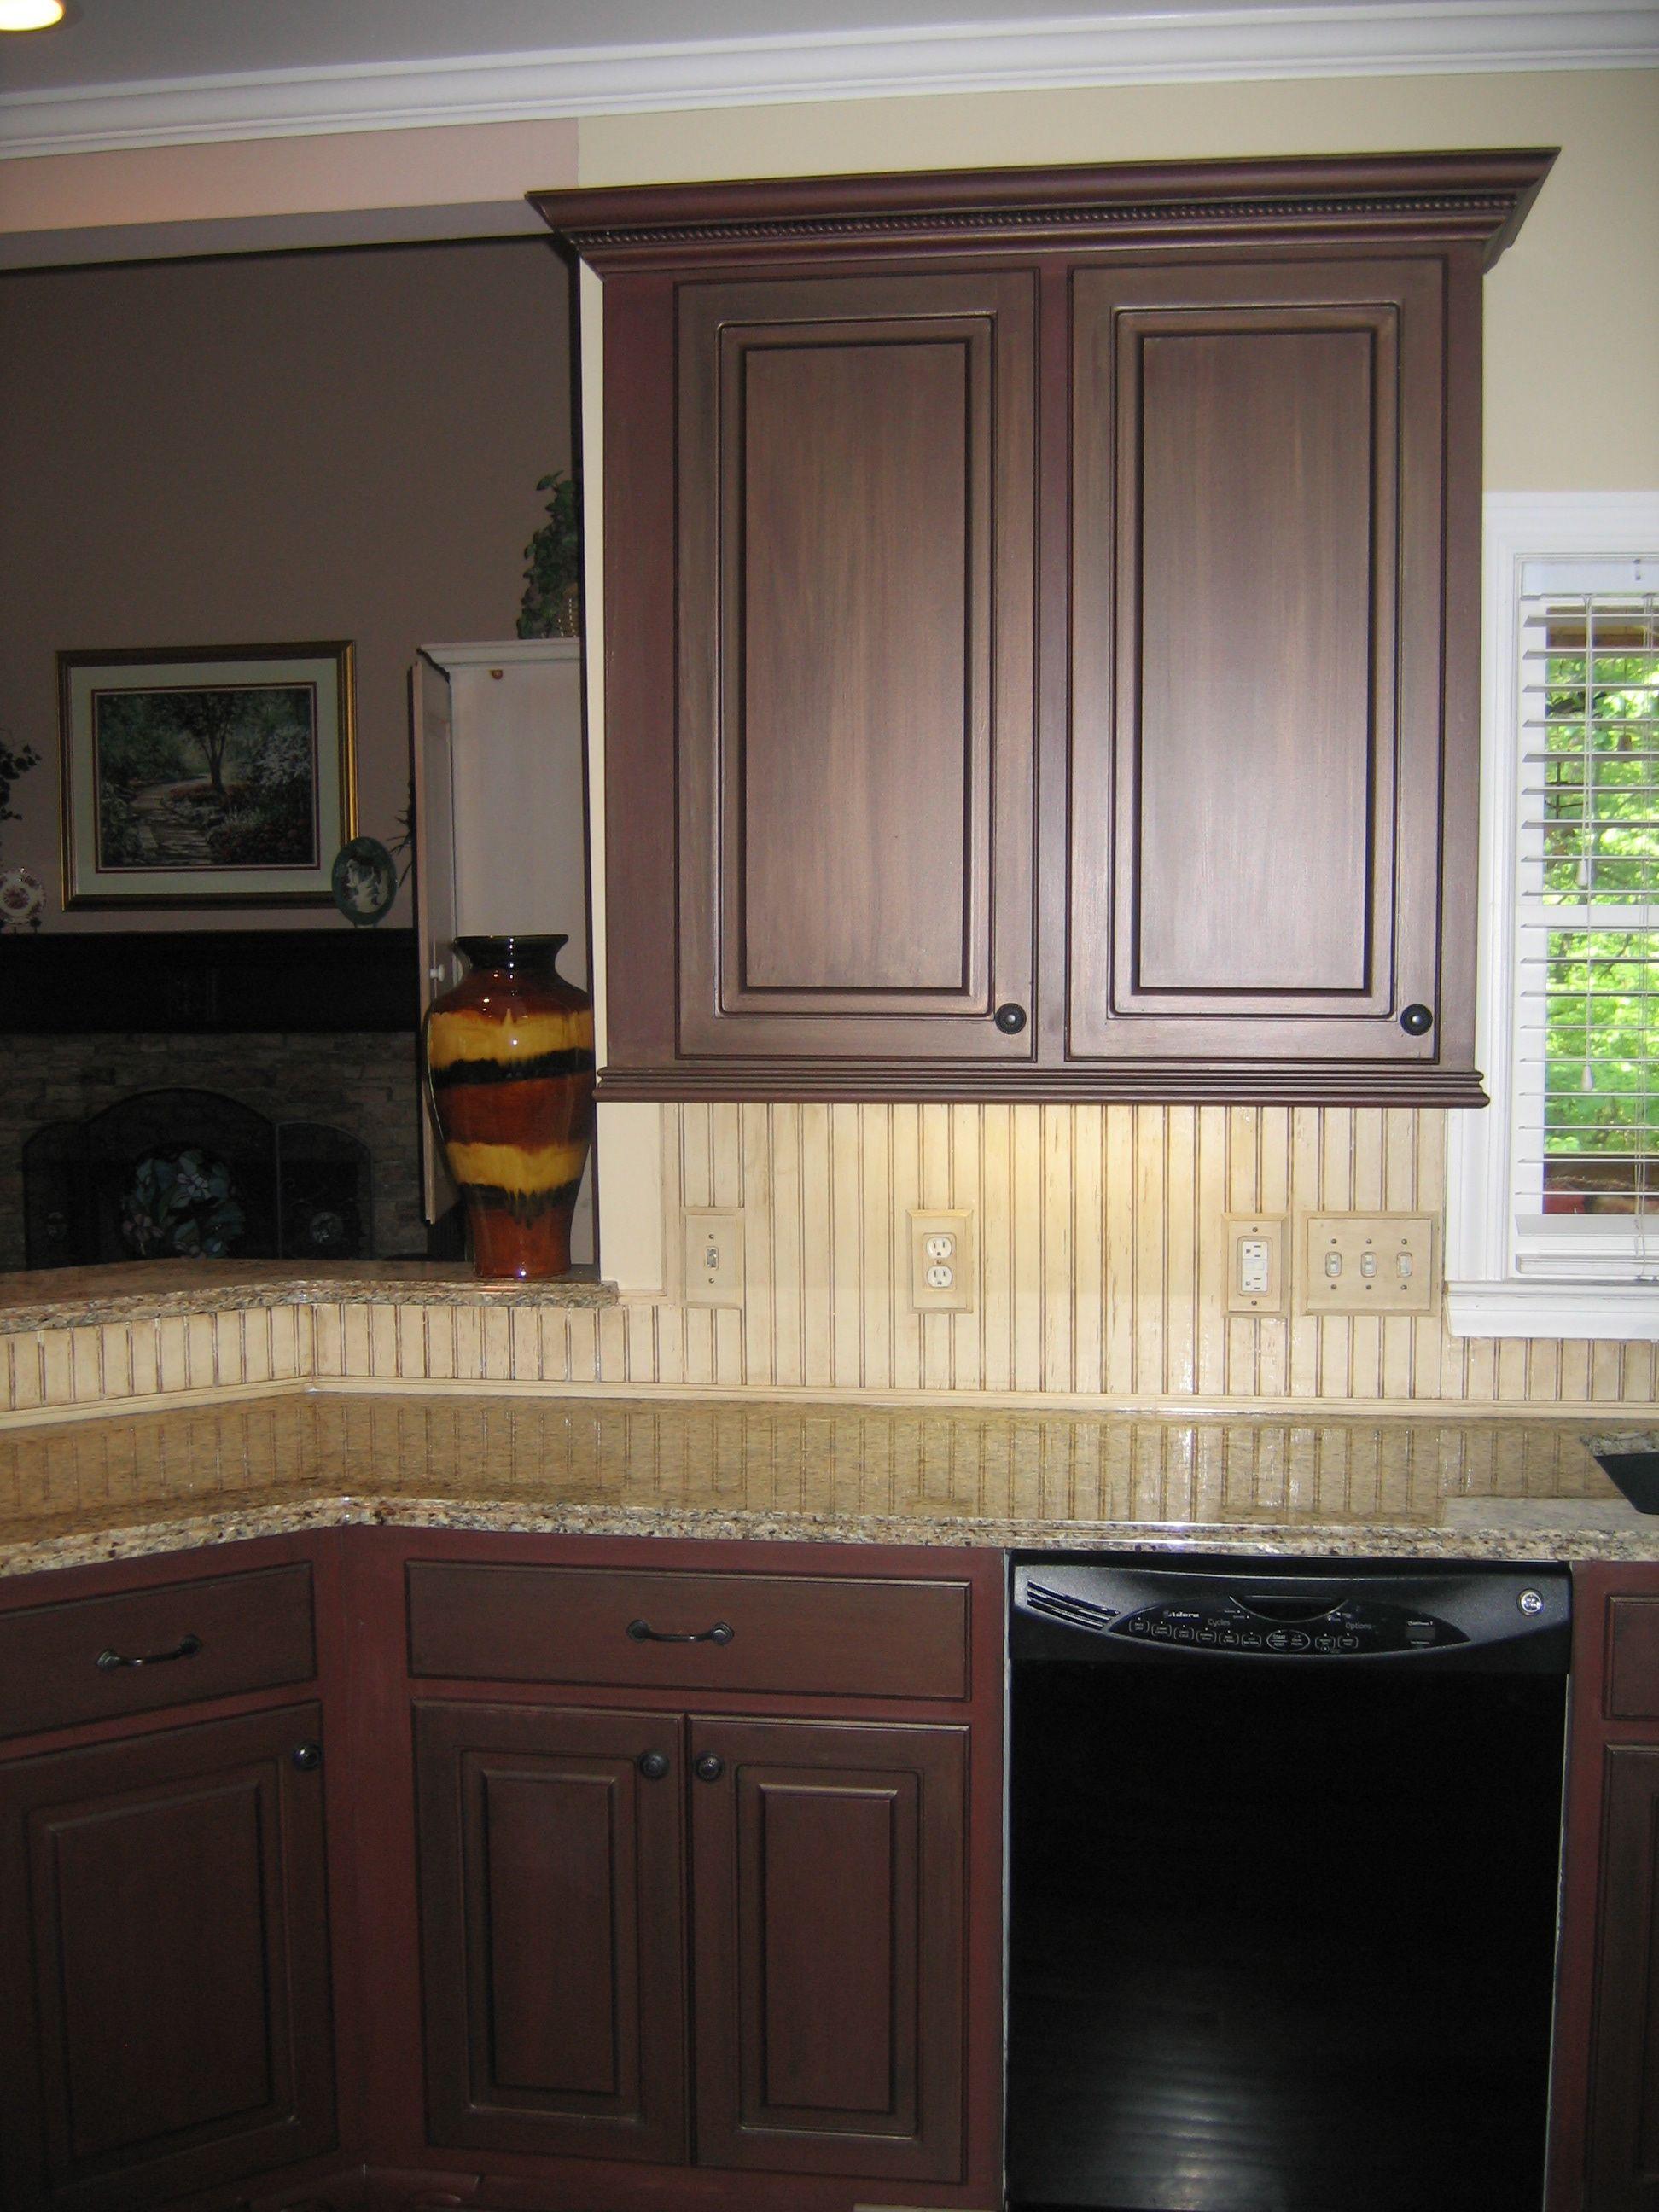 country kitchen backsplash ideas pictures an excellent home design